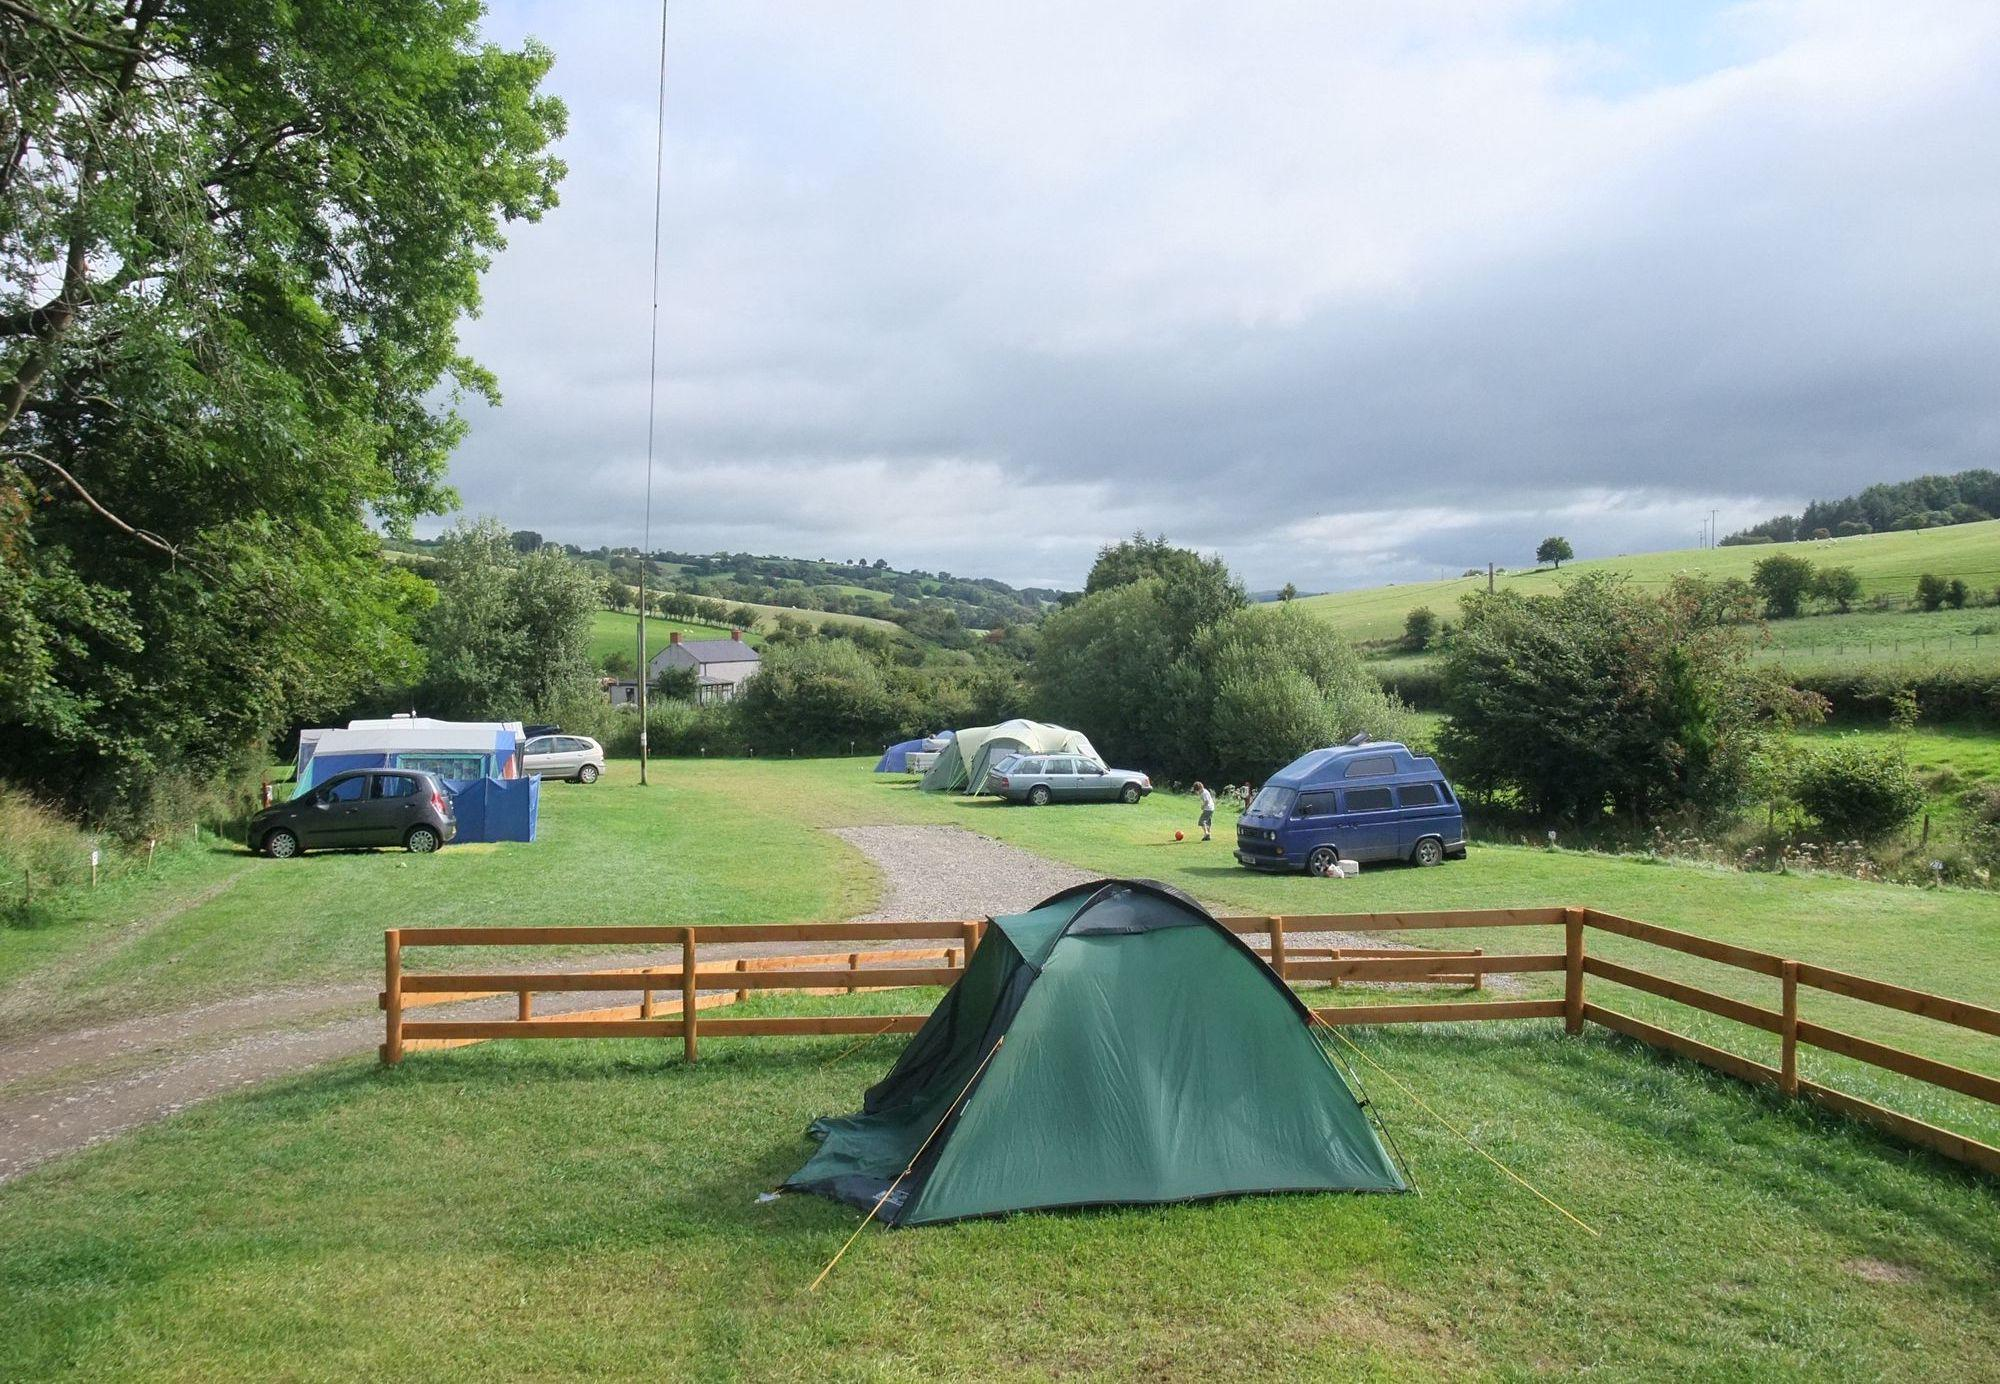 Llanrwst Camping | Campsites in Llanrwst, North Wales